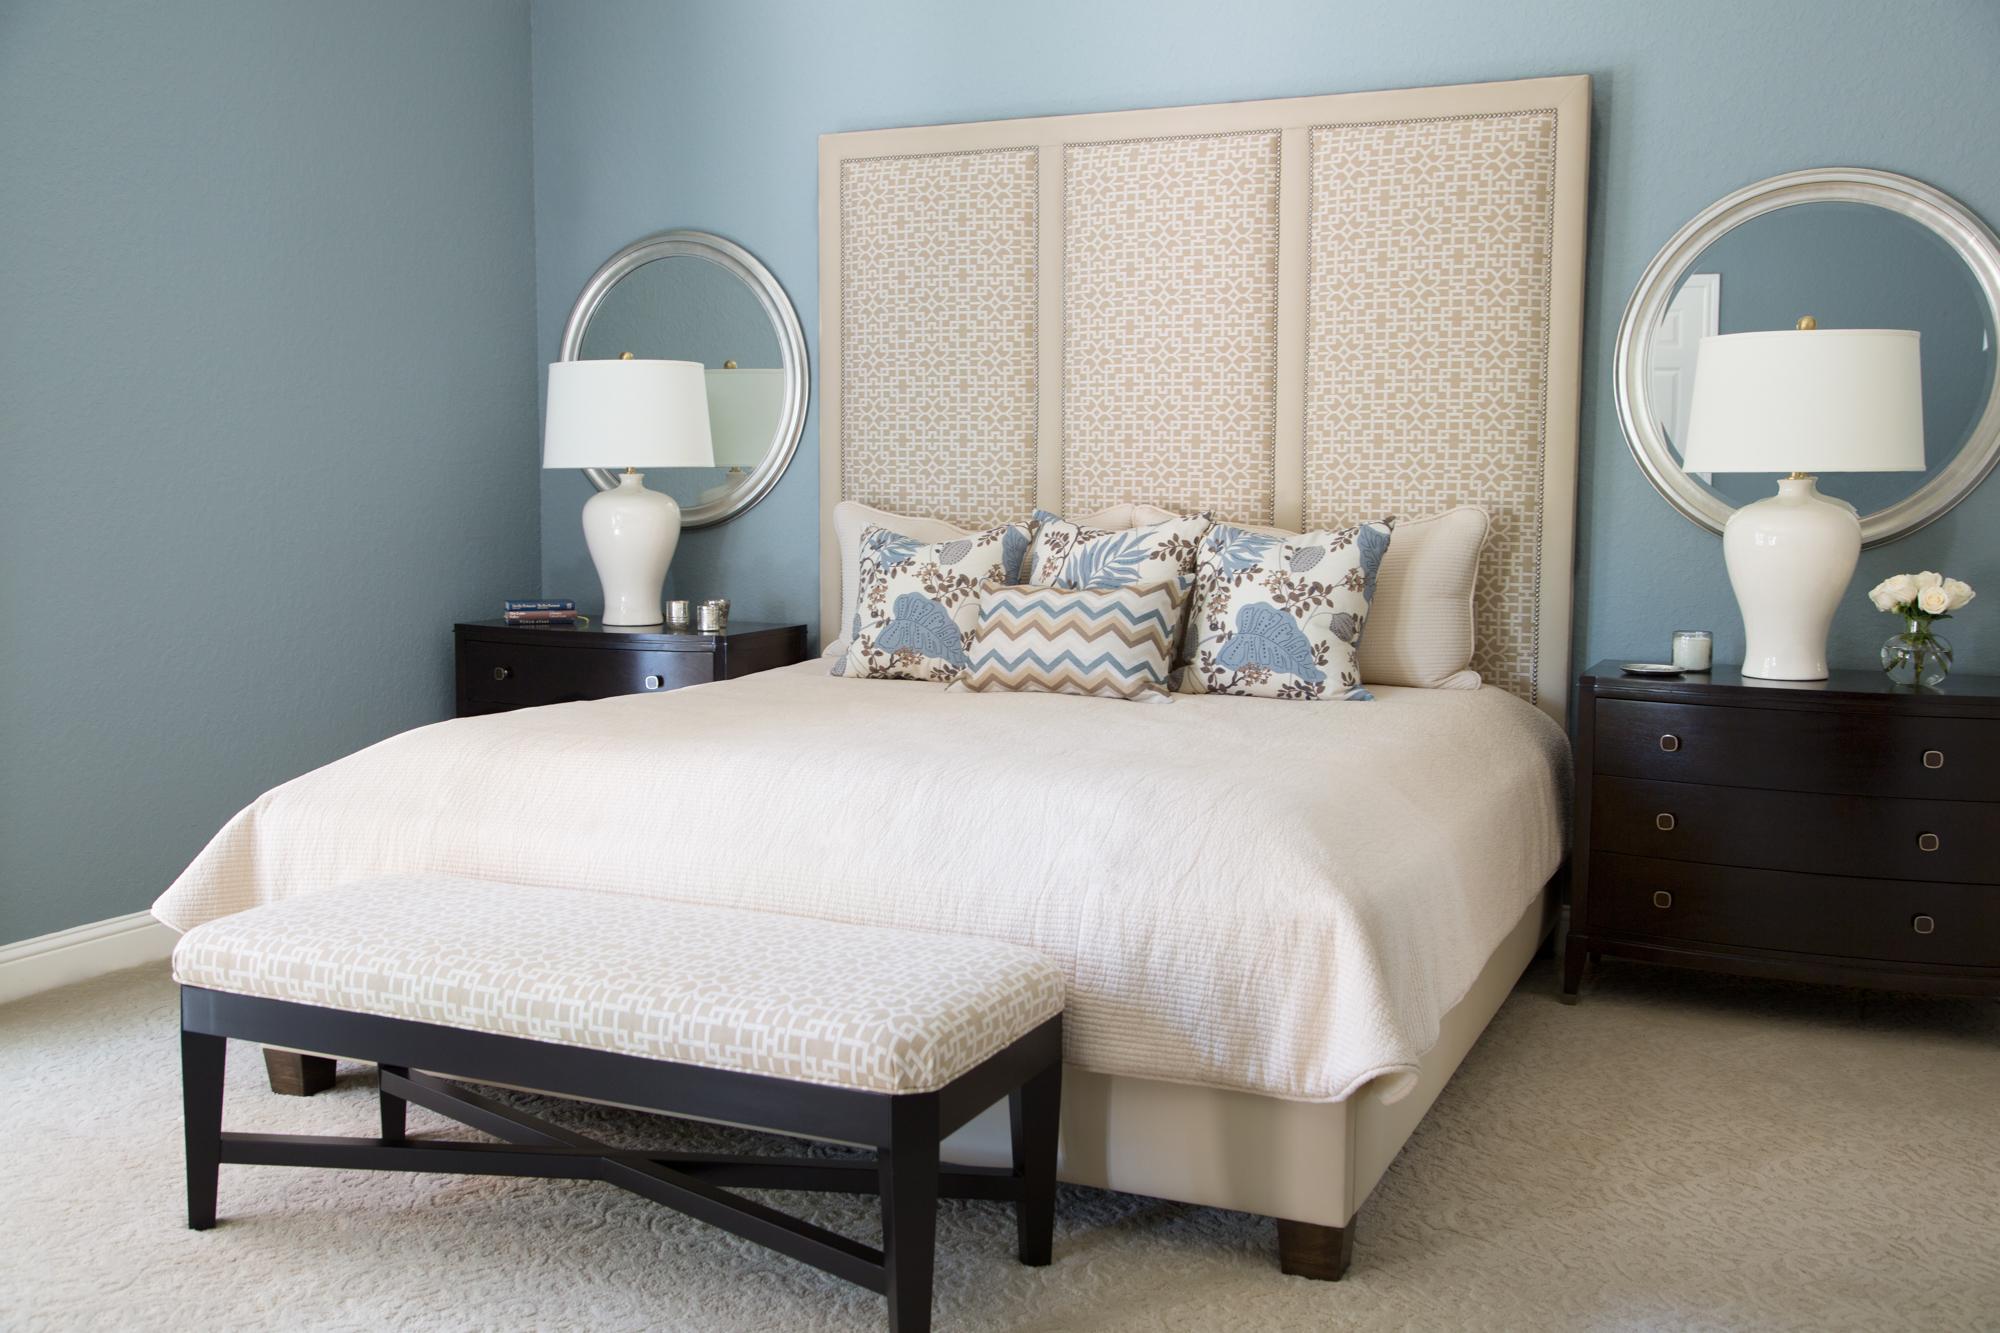 Bedroom; custom bedding; lamp; decorative pillow; headboard; mirror; etc. | Interior Designer: Carla Aston